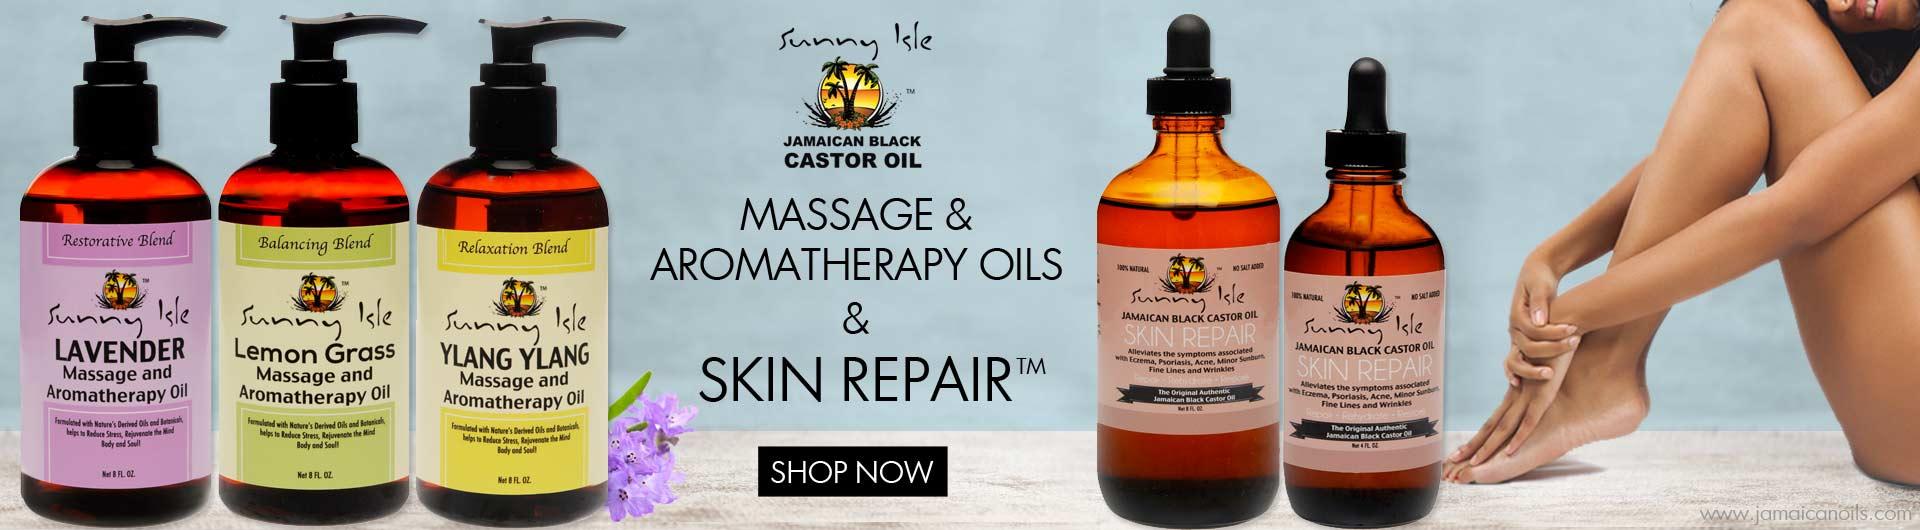 Sunny Isle Massage and Skin Care